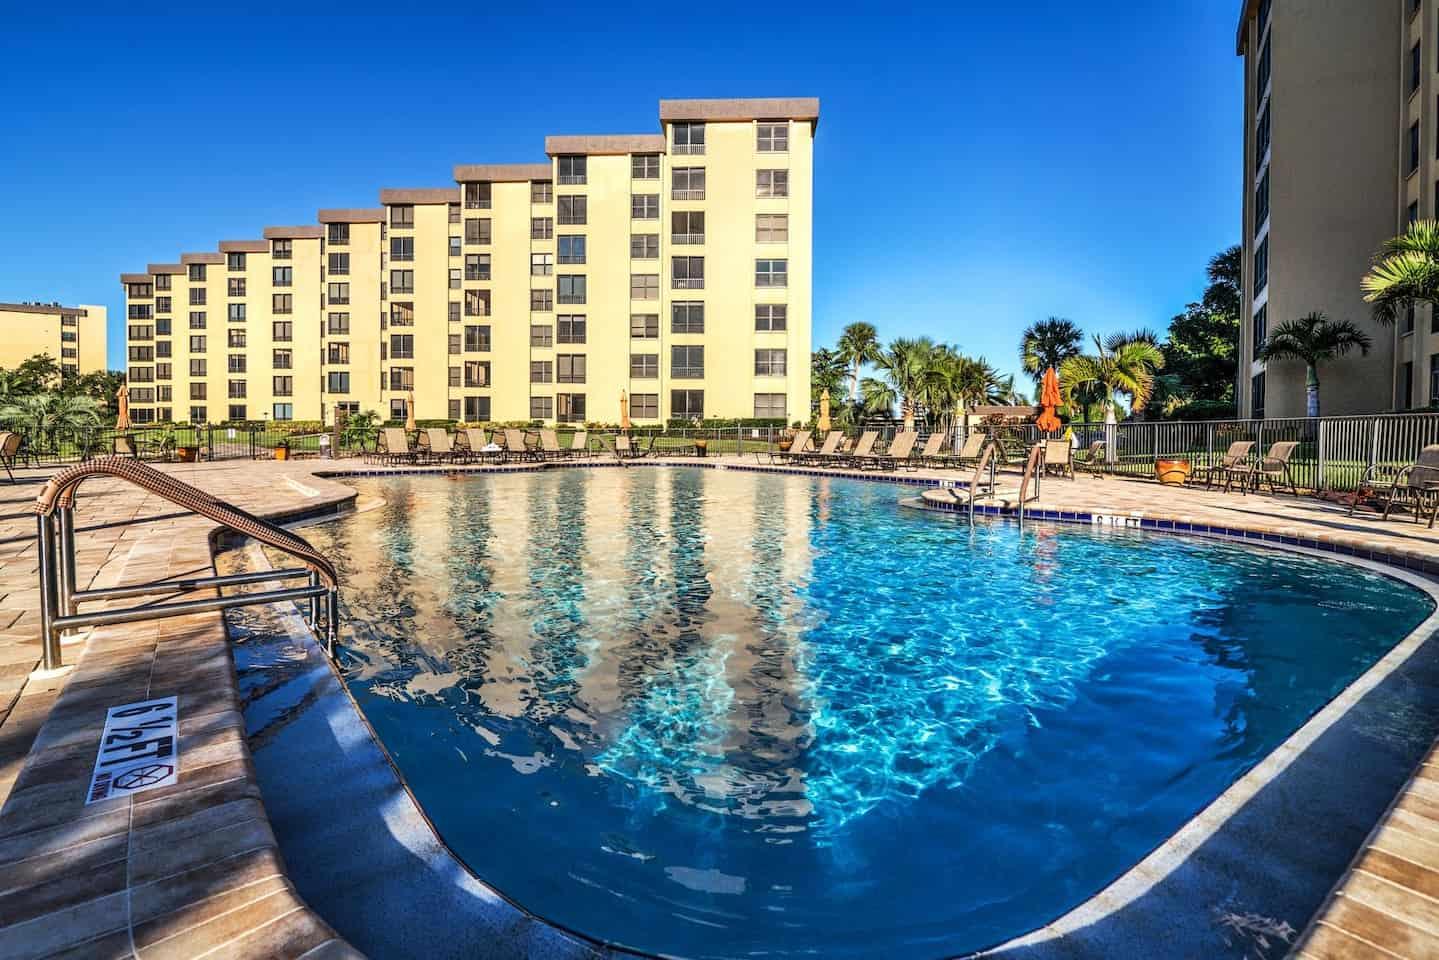 Image of Airbnb rental in Sarasota